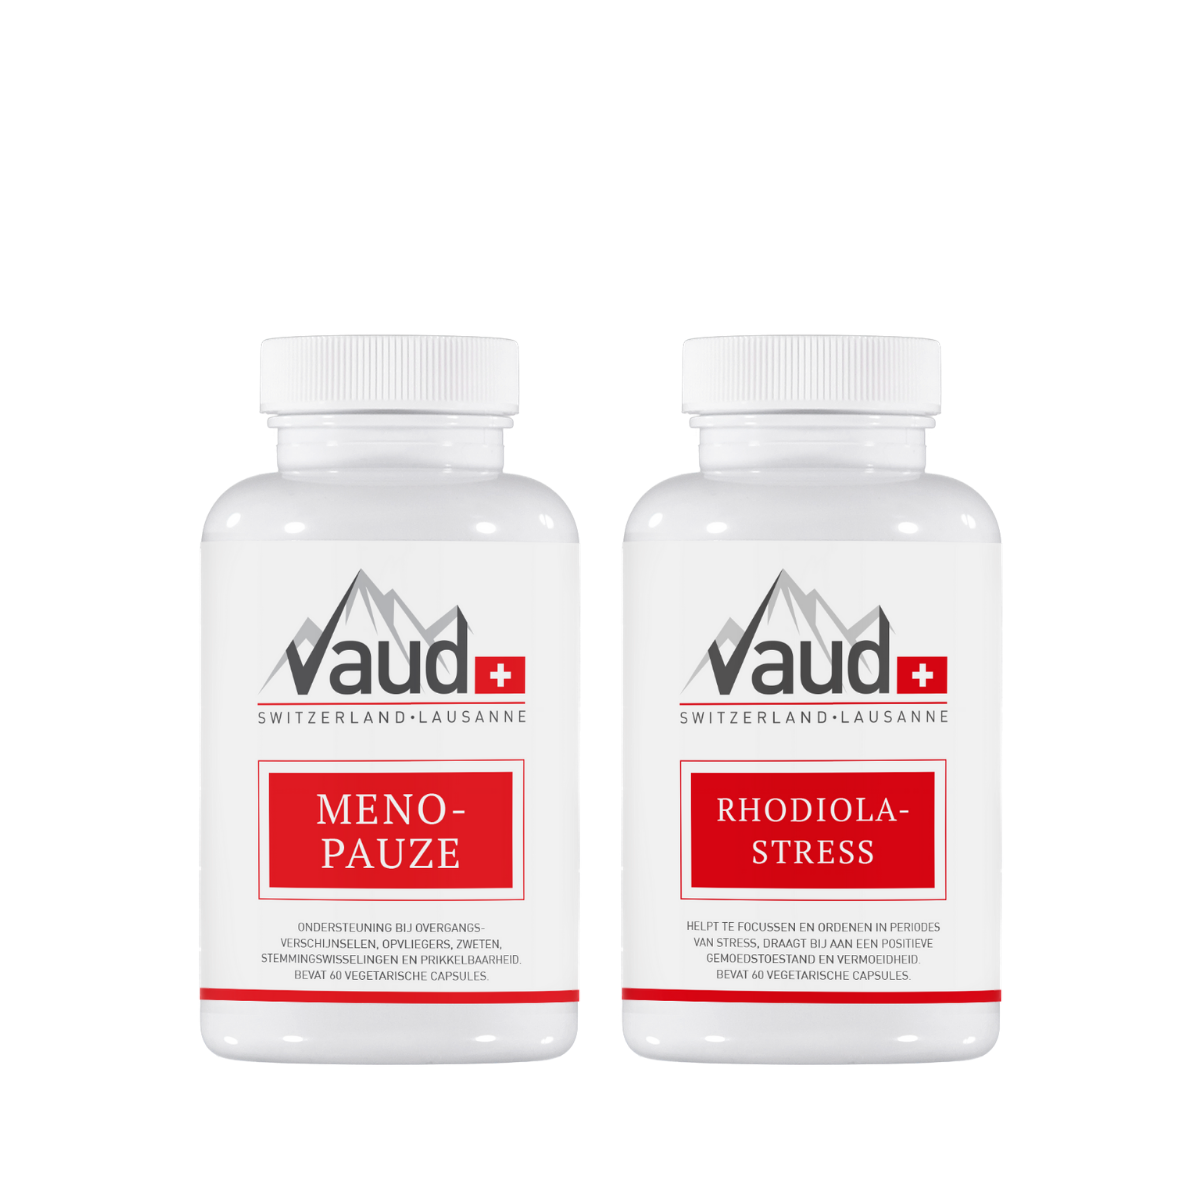 Menopauze + rhodiola-stressMenopauze + rhodiola-stress